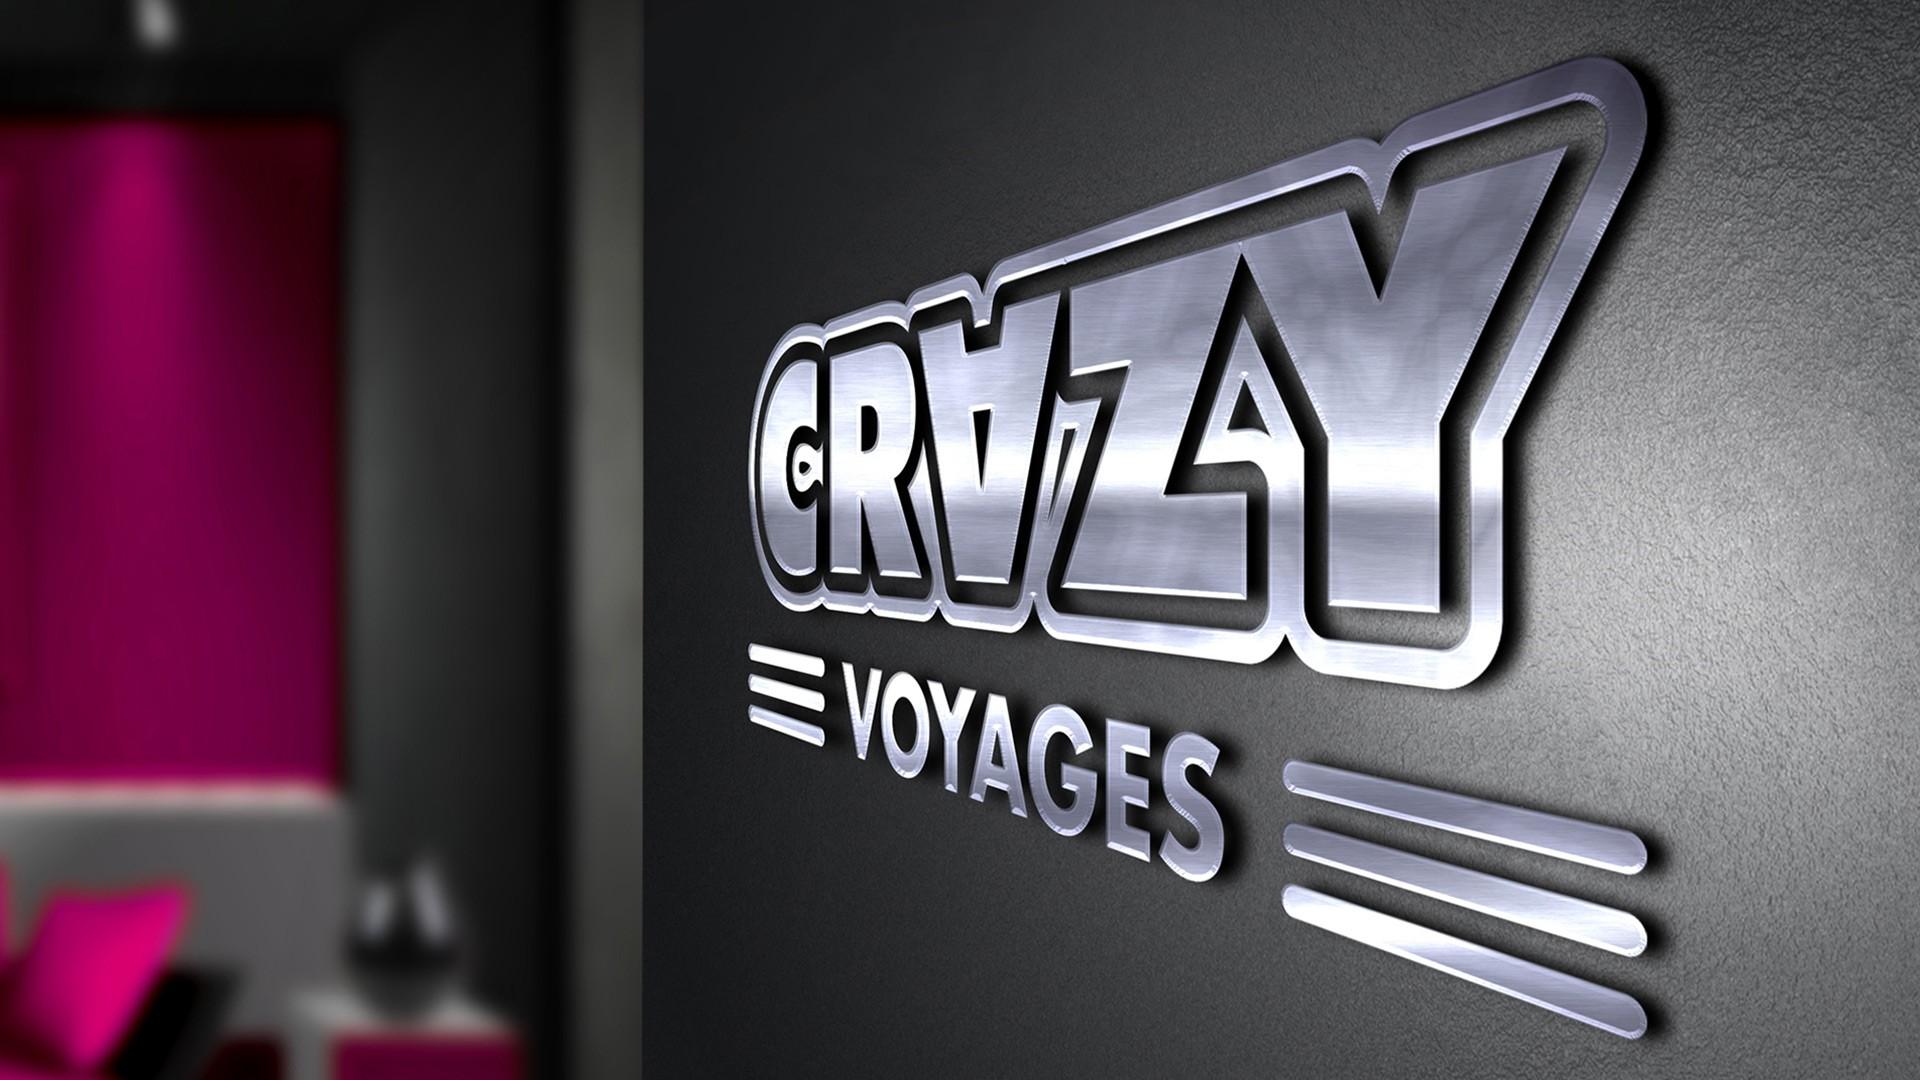 Crazy-voyages